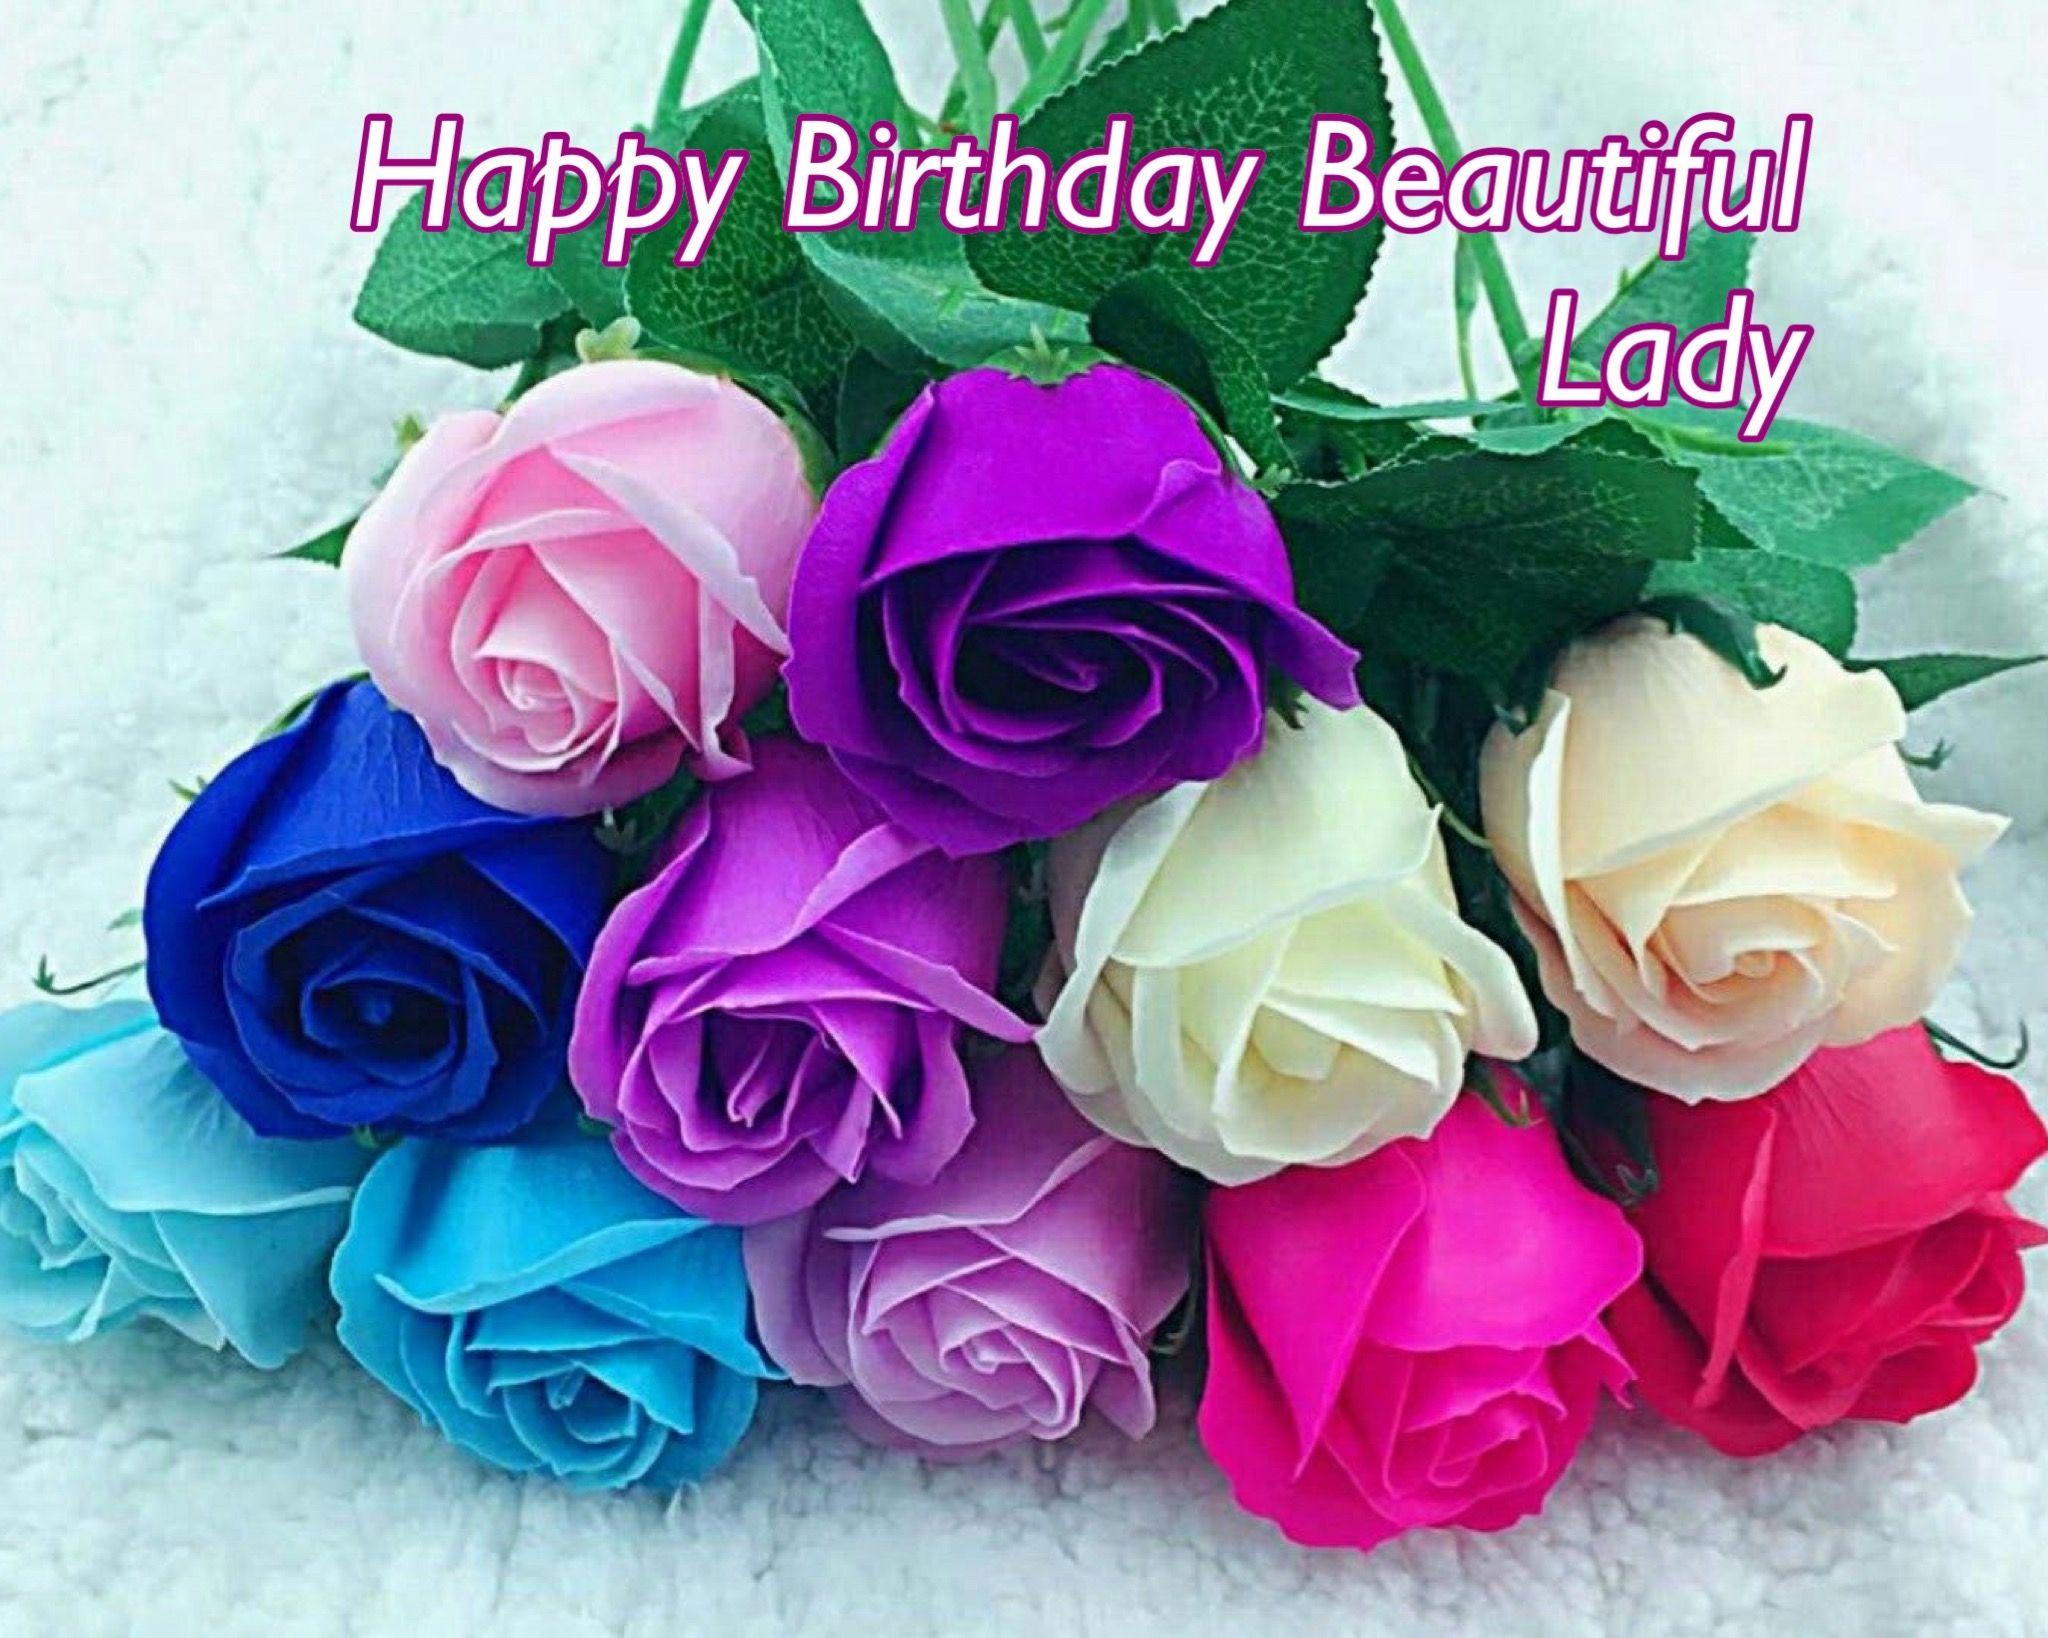 Happy Birthday Lady Images ~ Happy birthday beautiful lady birthday cards cakes